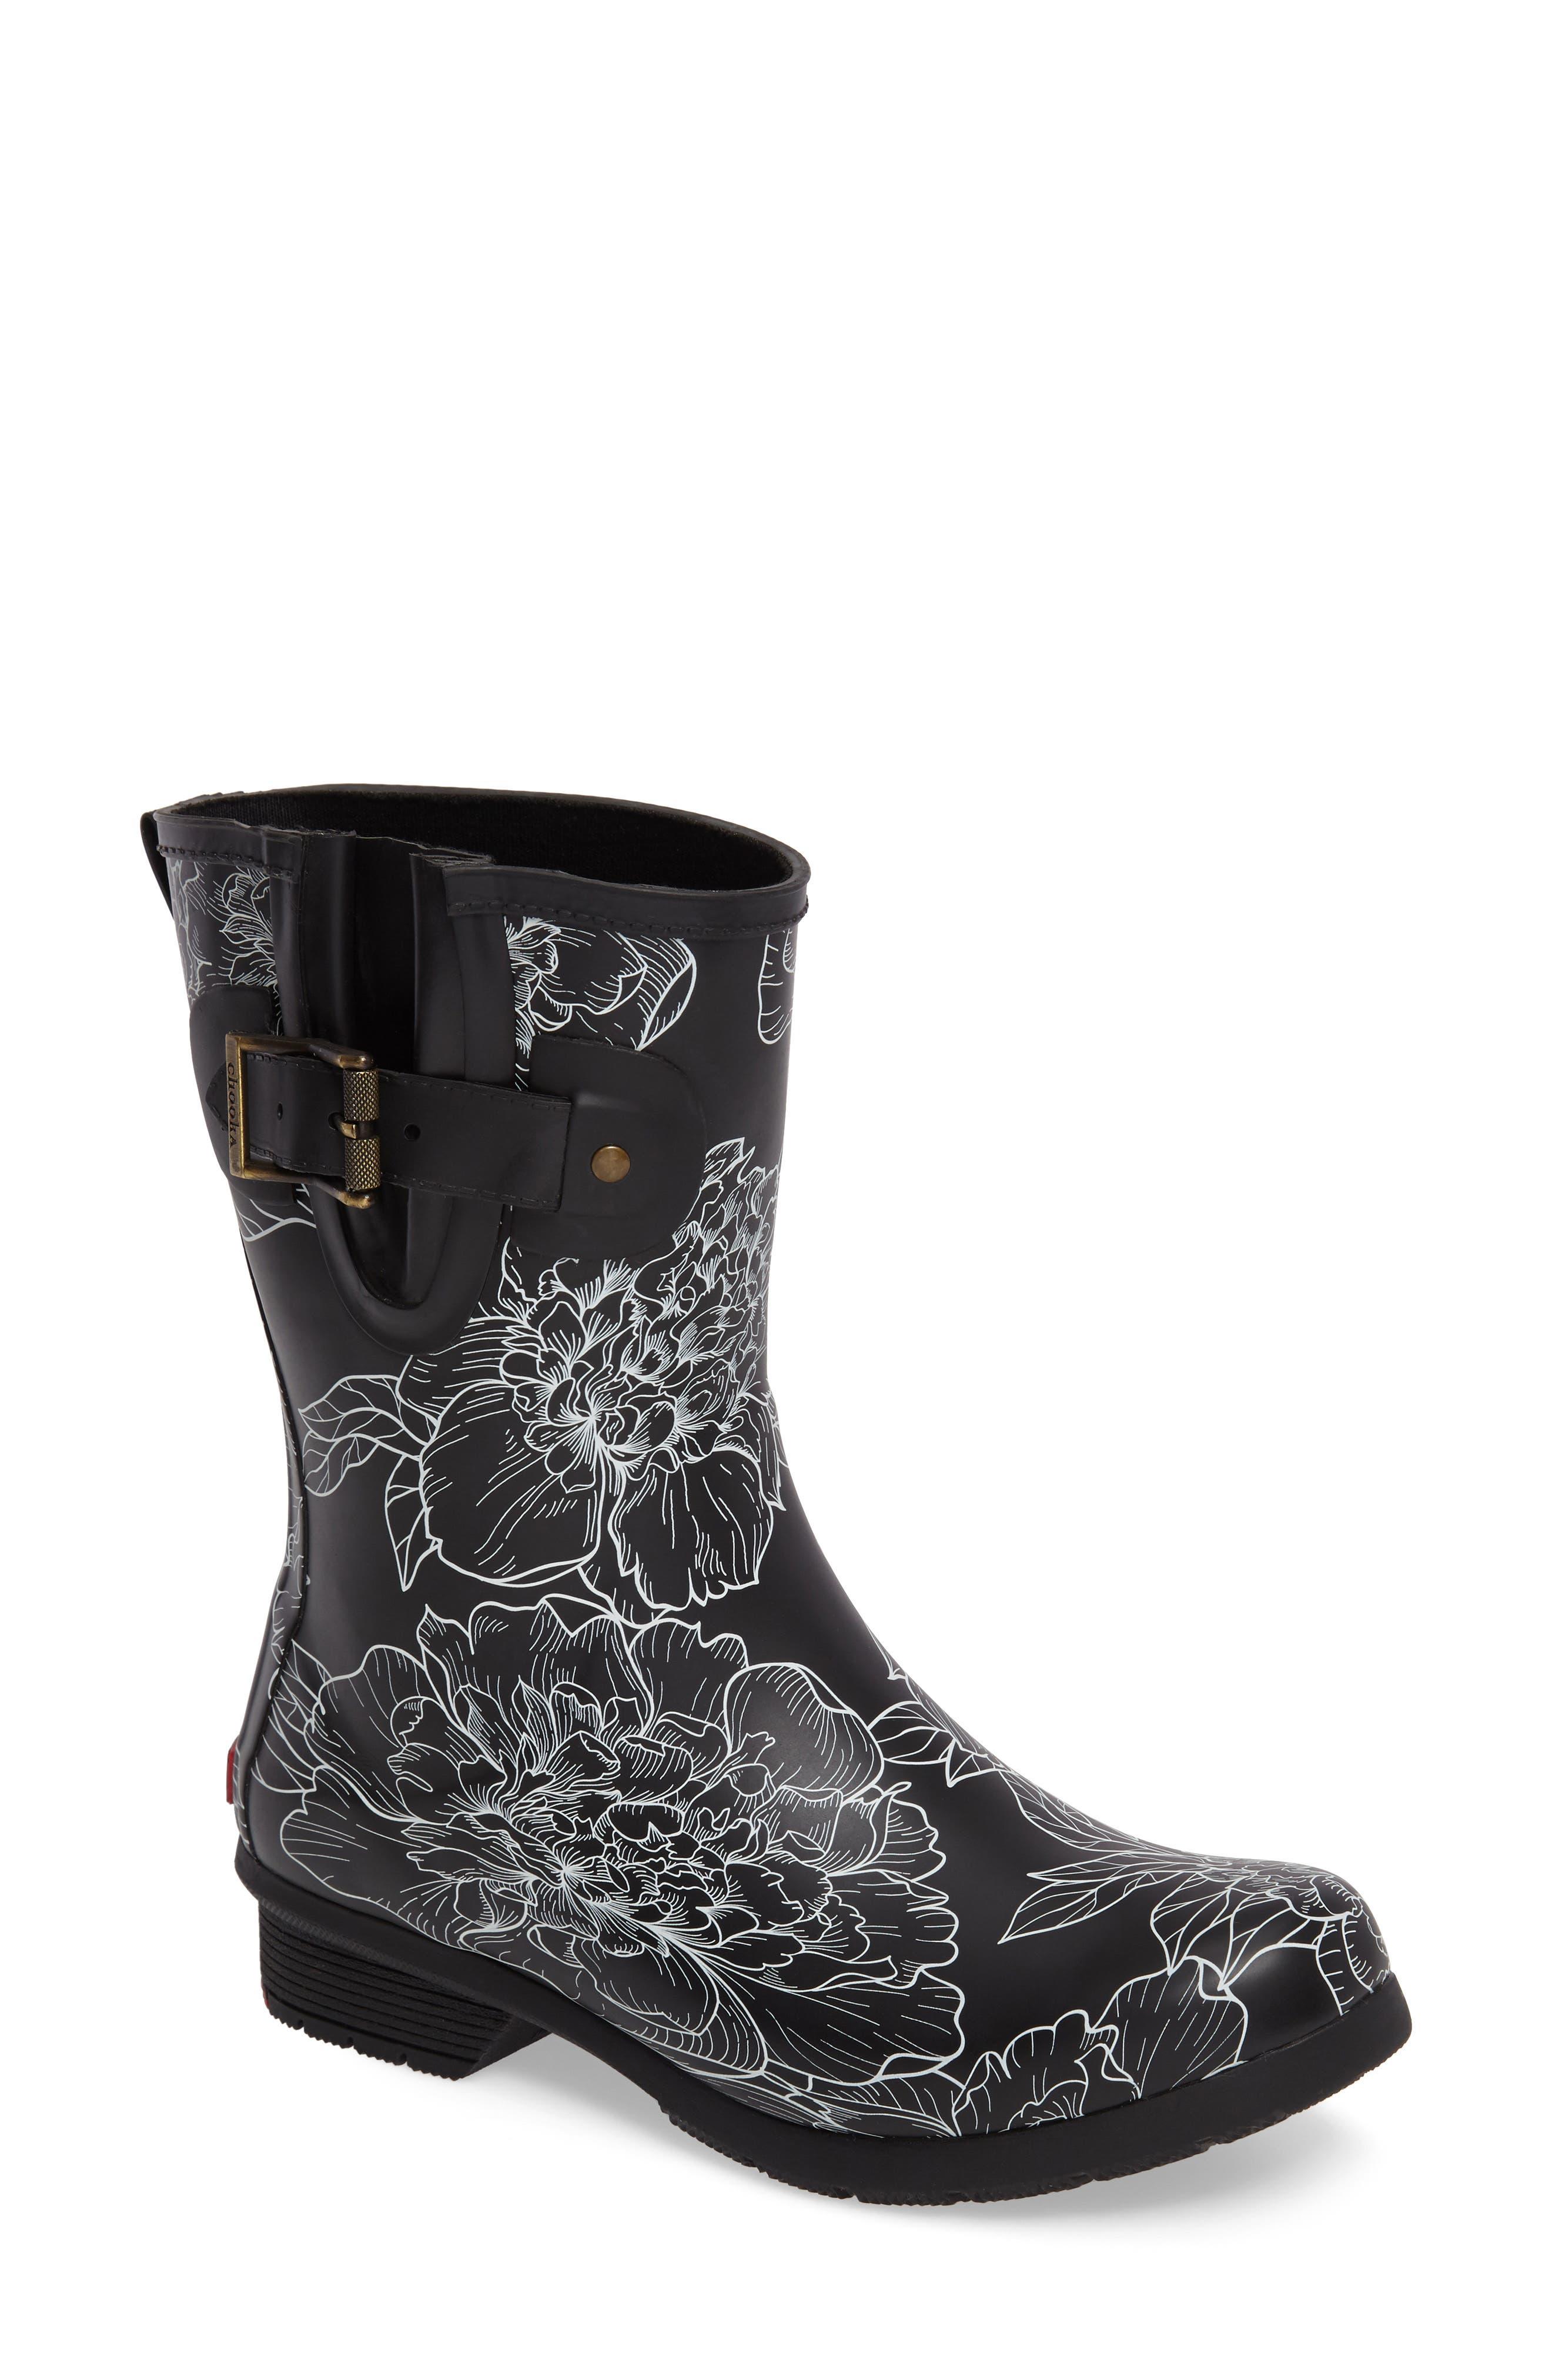 Alternate Image 1 Selected - Chooka Cora Mid Rain Boot (Women)